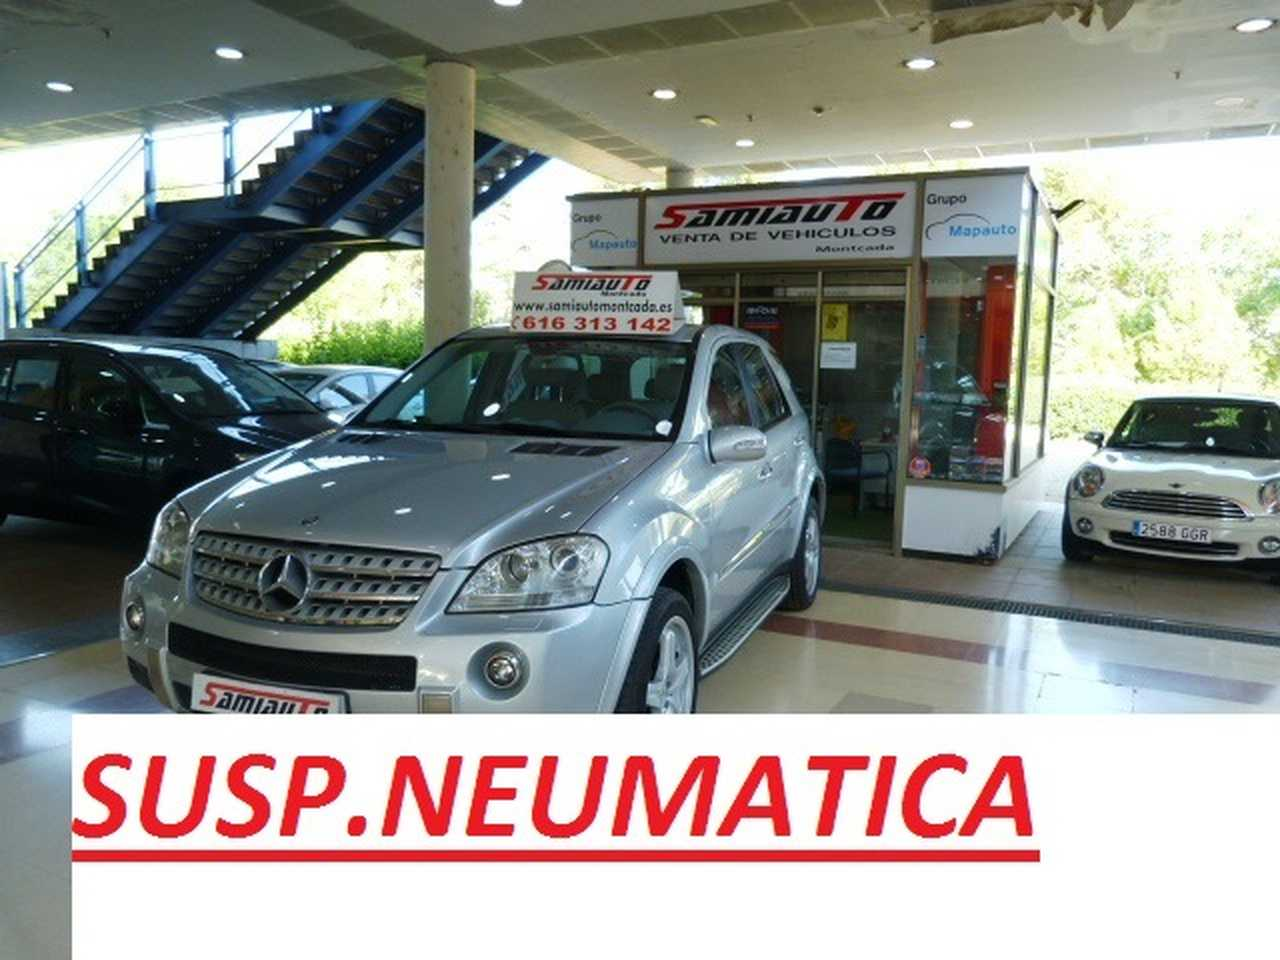 Mercedes Clase M Clase M ML 320 CDI 4M 5p AUTOMATICO UN SOLO PROPIETARIO LIBRO DE REVISIONES  - Foto 1